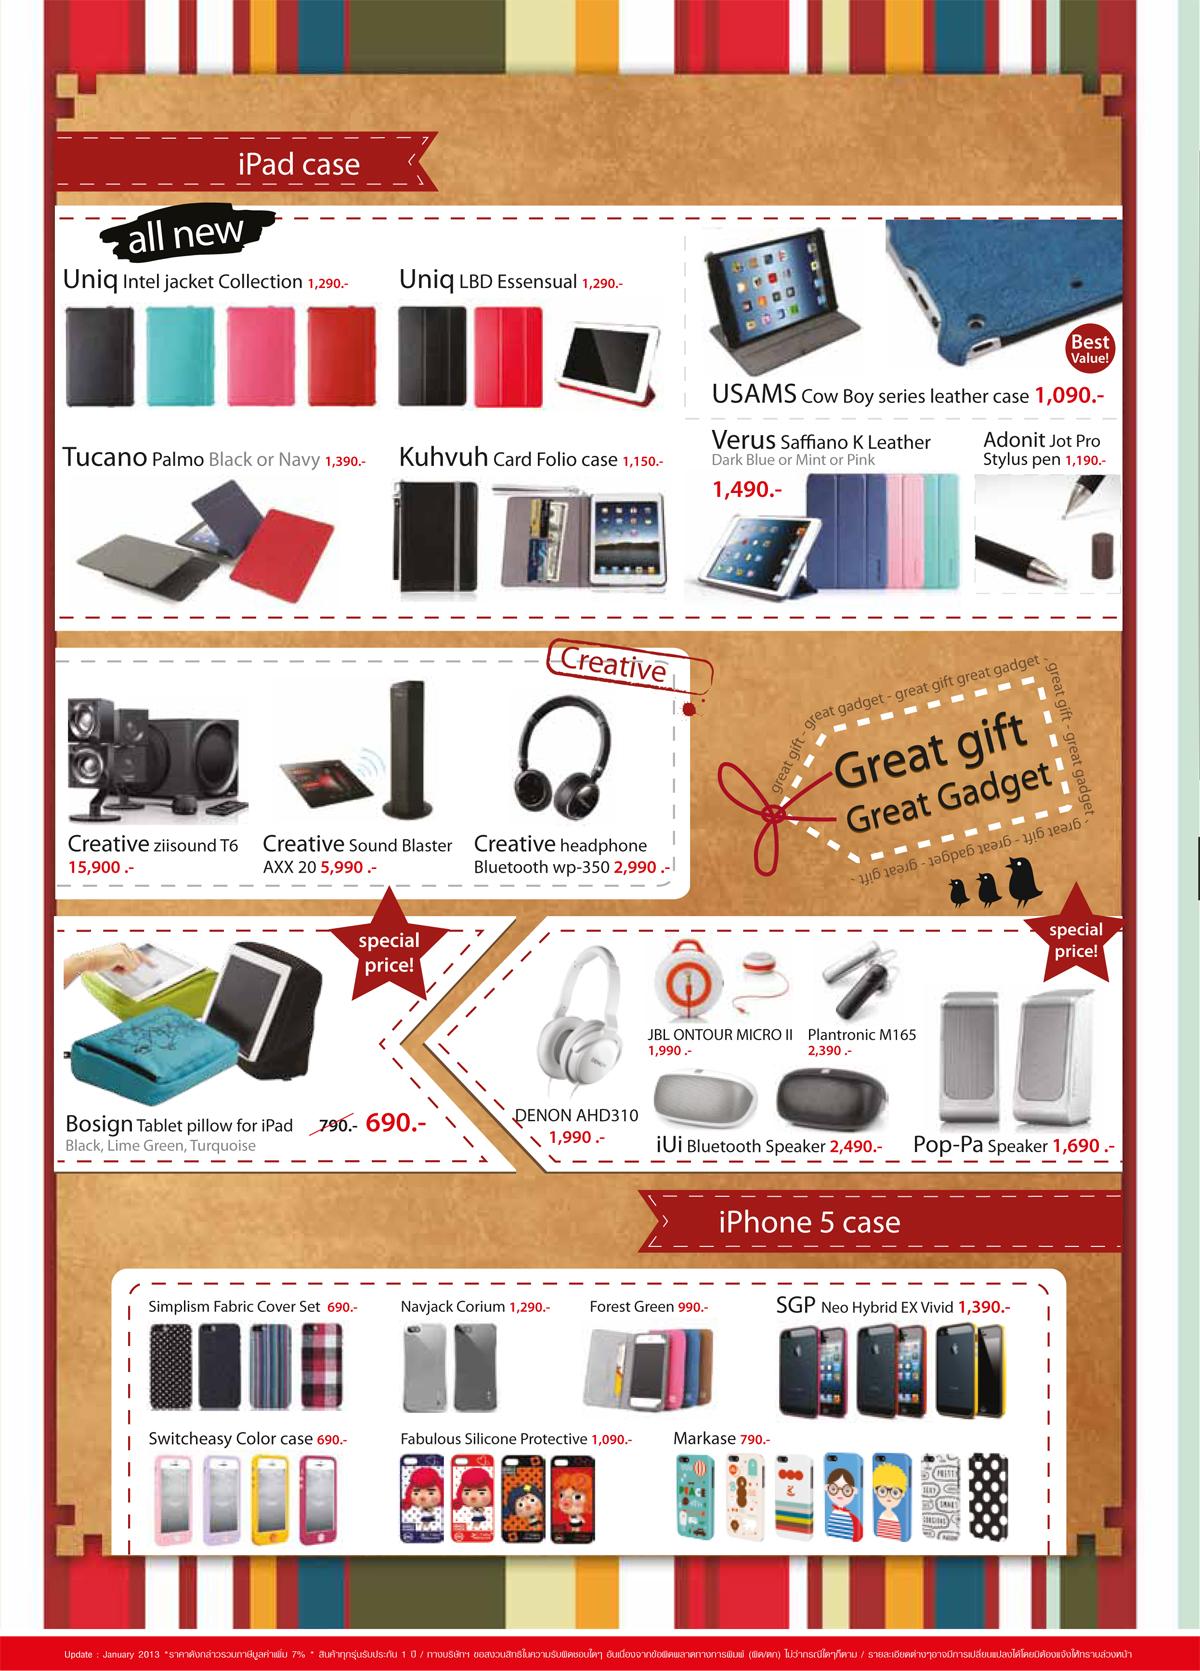 Brochure Maccomseven January 2013 5